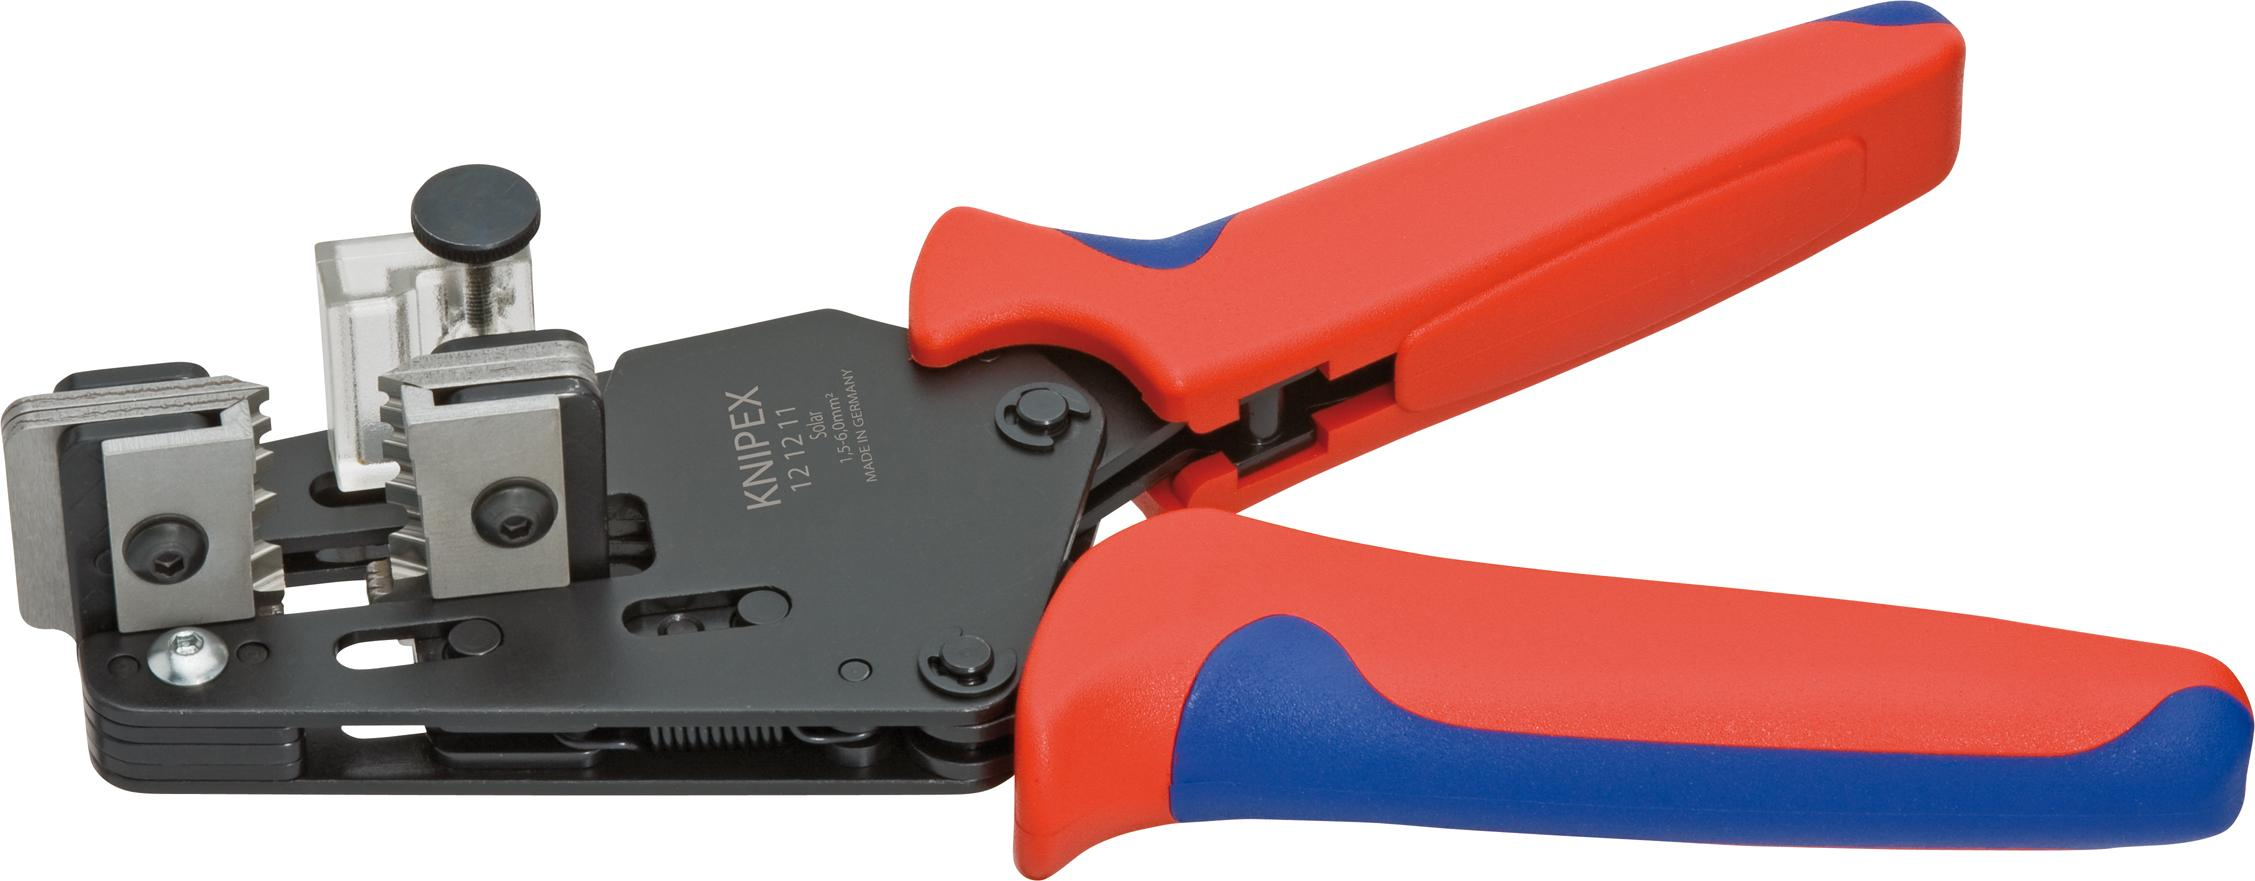 Automatik-Abisolierzange 1,50- 6,00 qmm Knipex Bild 1